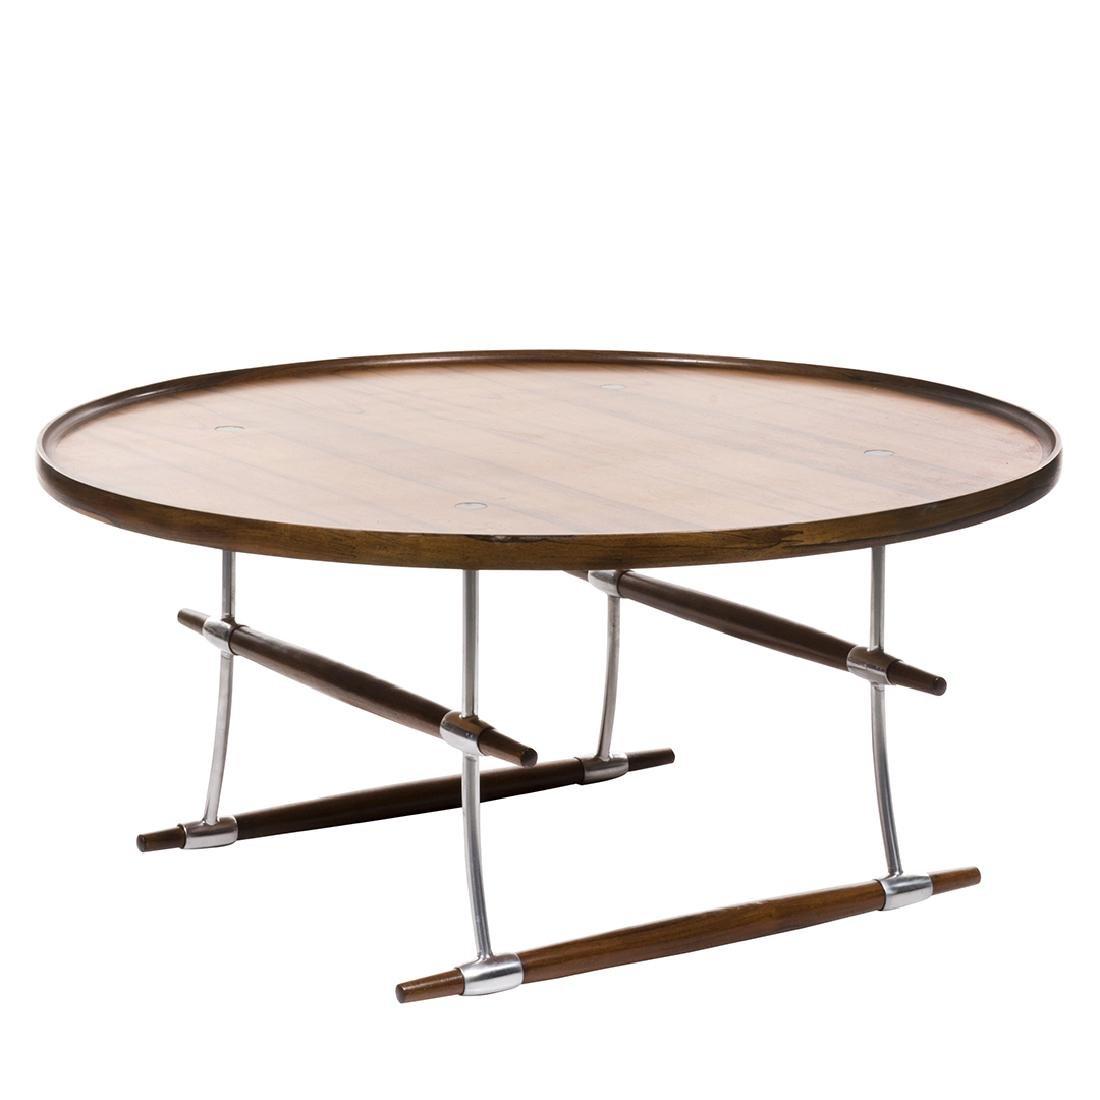 Jens Quistgaard Stokke Table